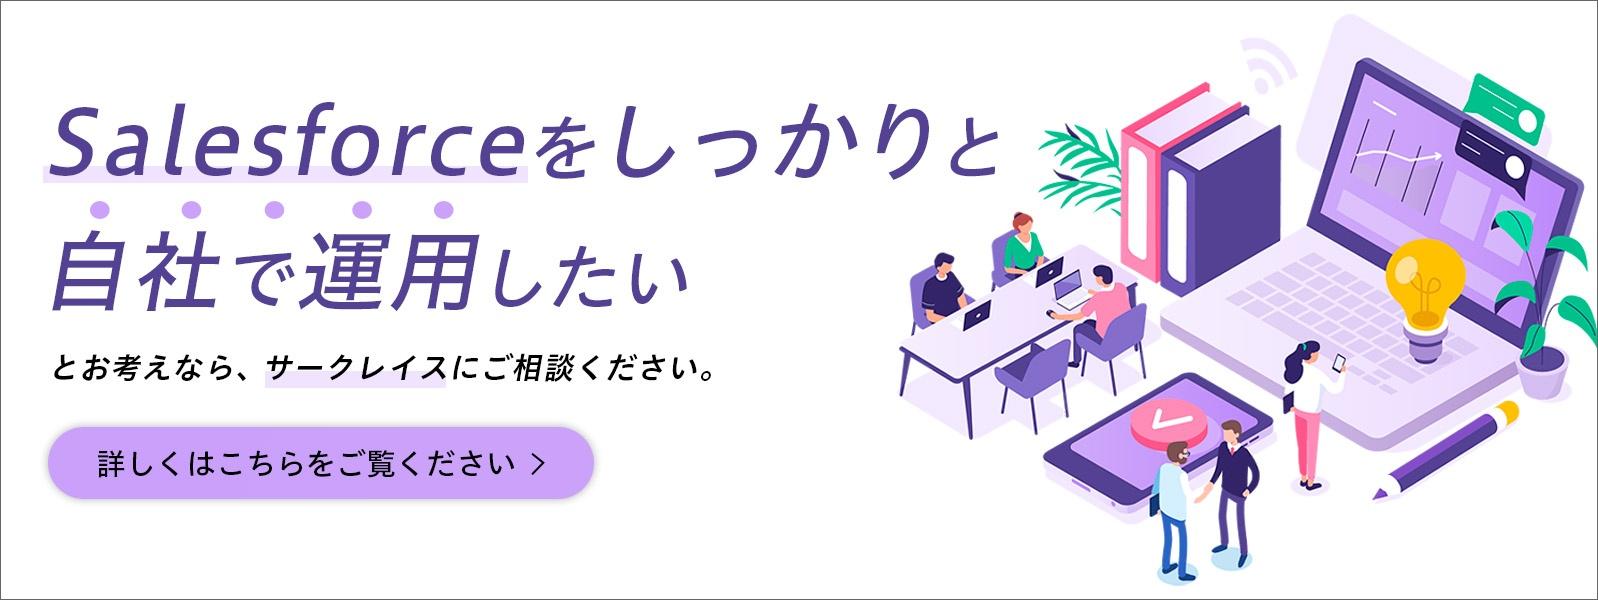 salesforce_training_campaign